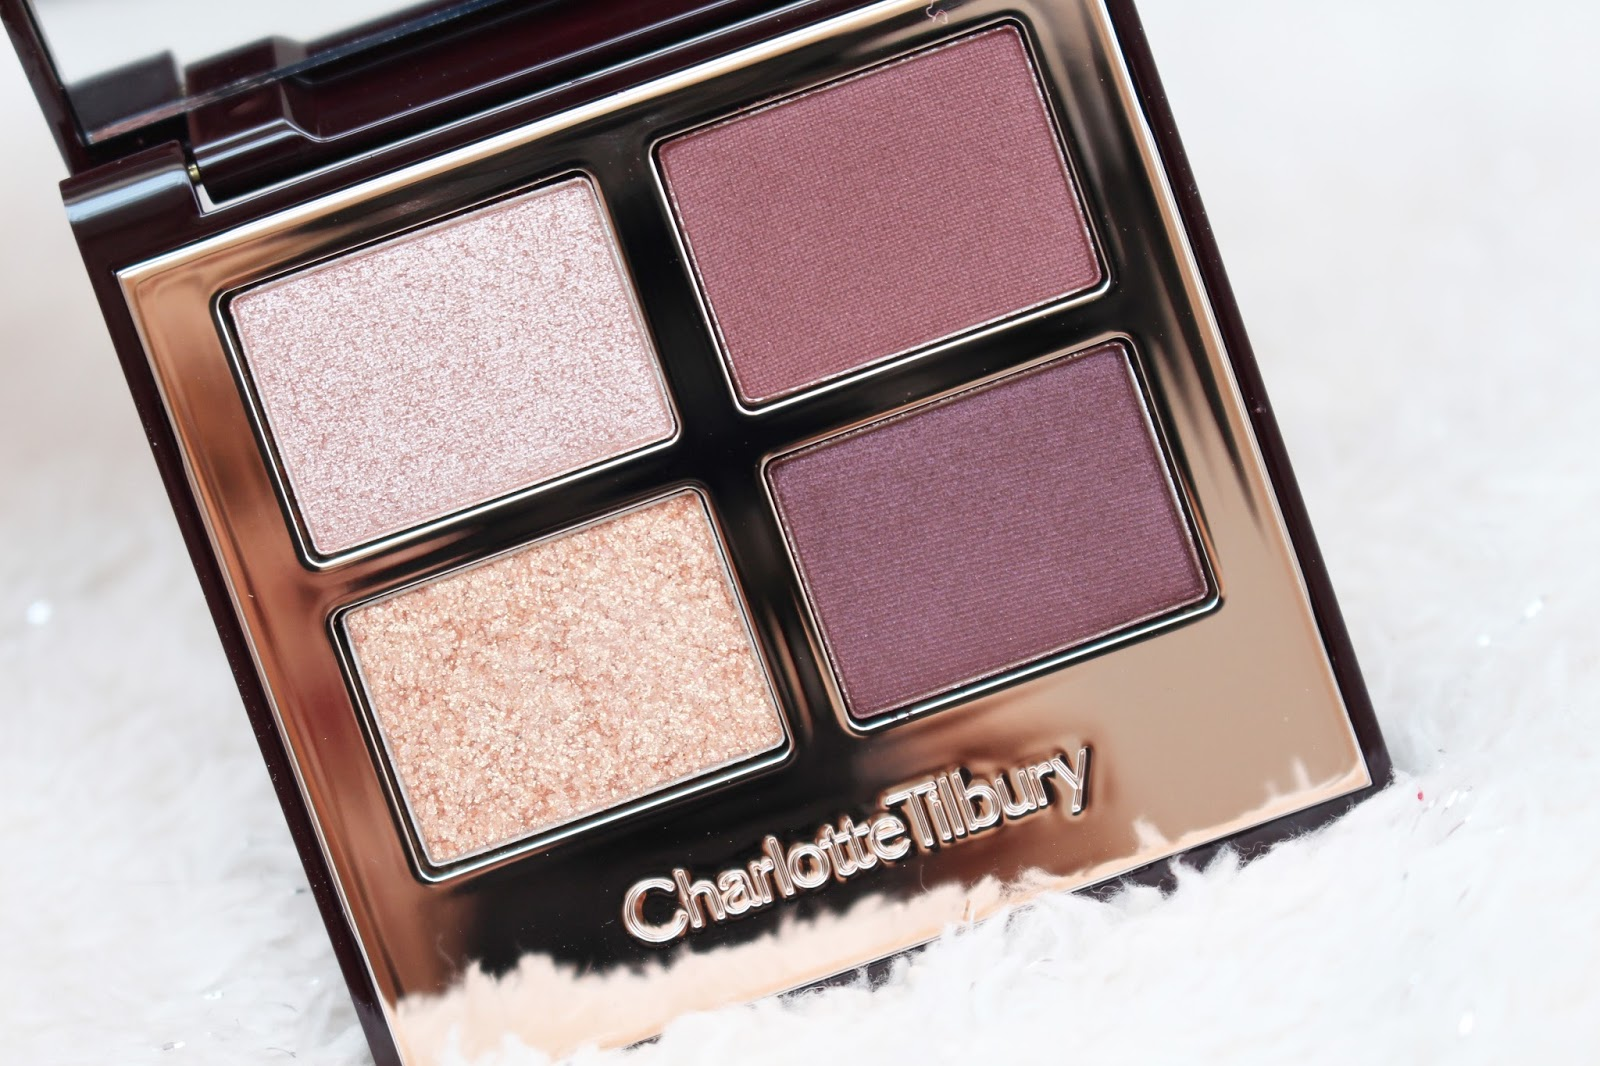 Charlotte Tilbury The Vintage Vamp Palette